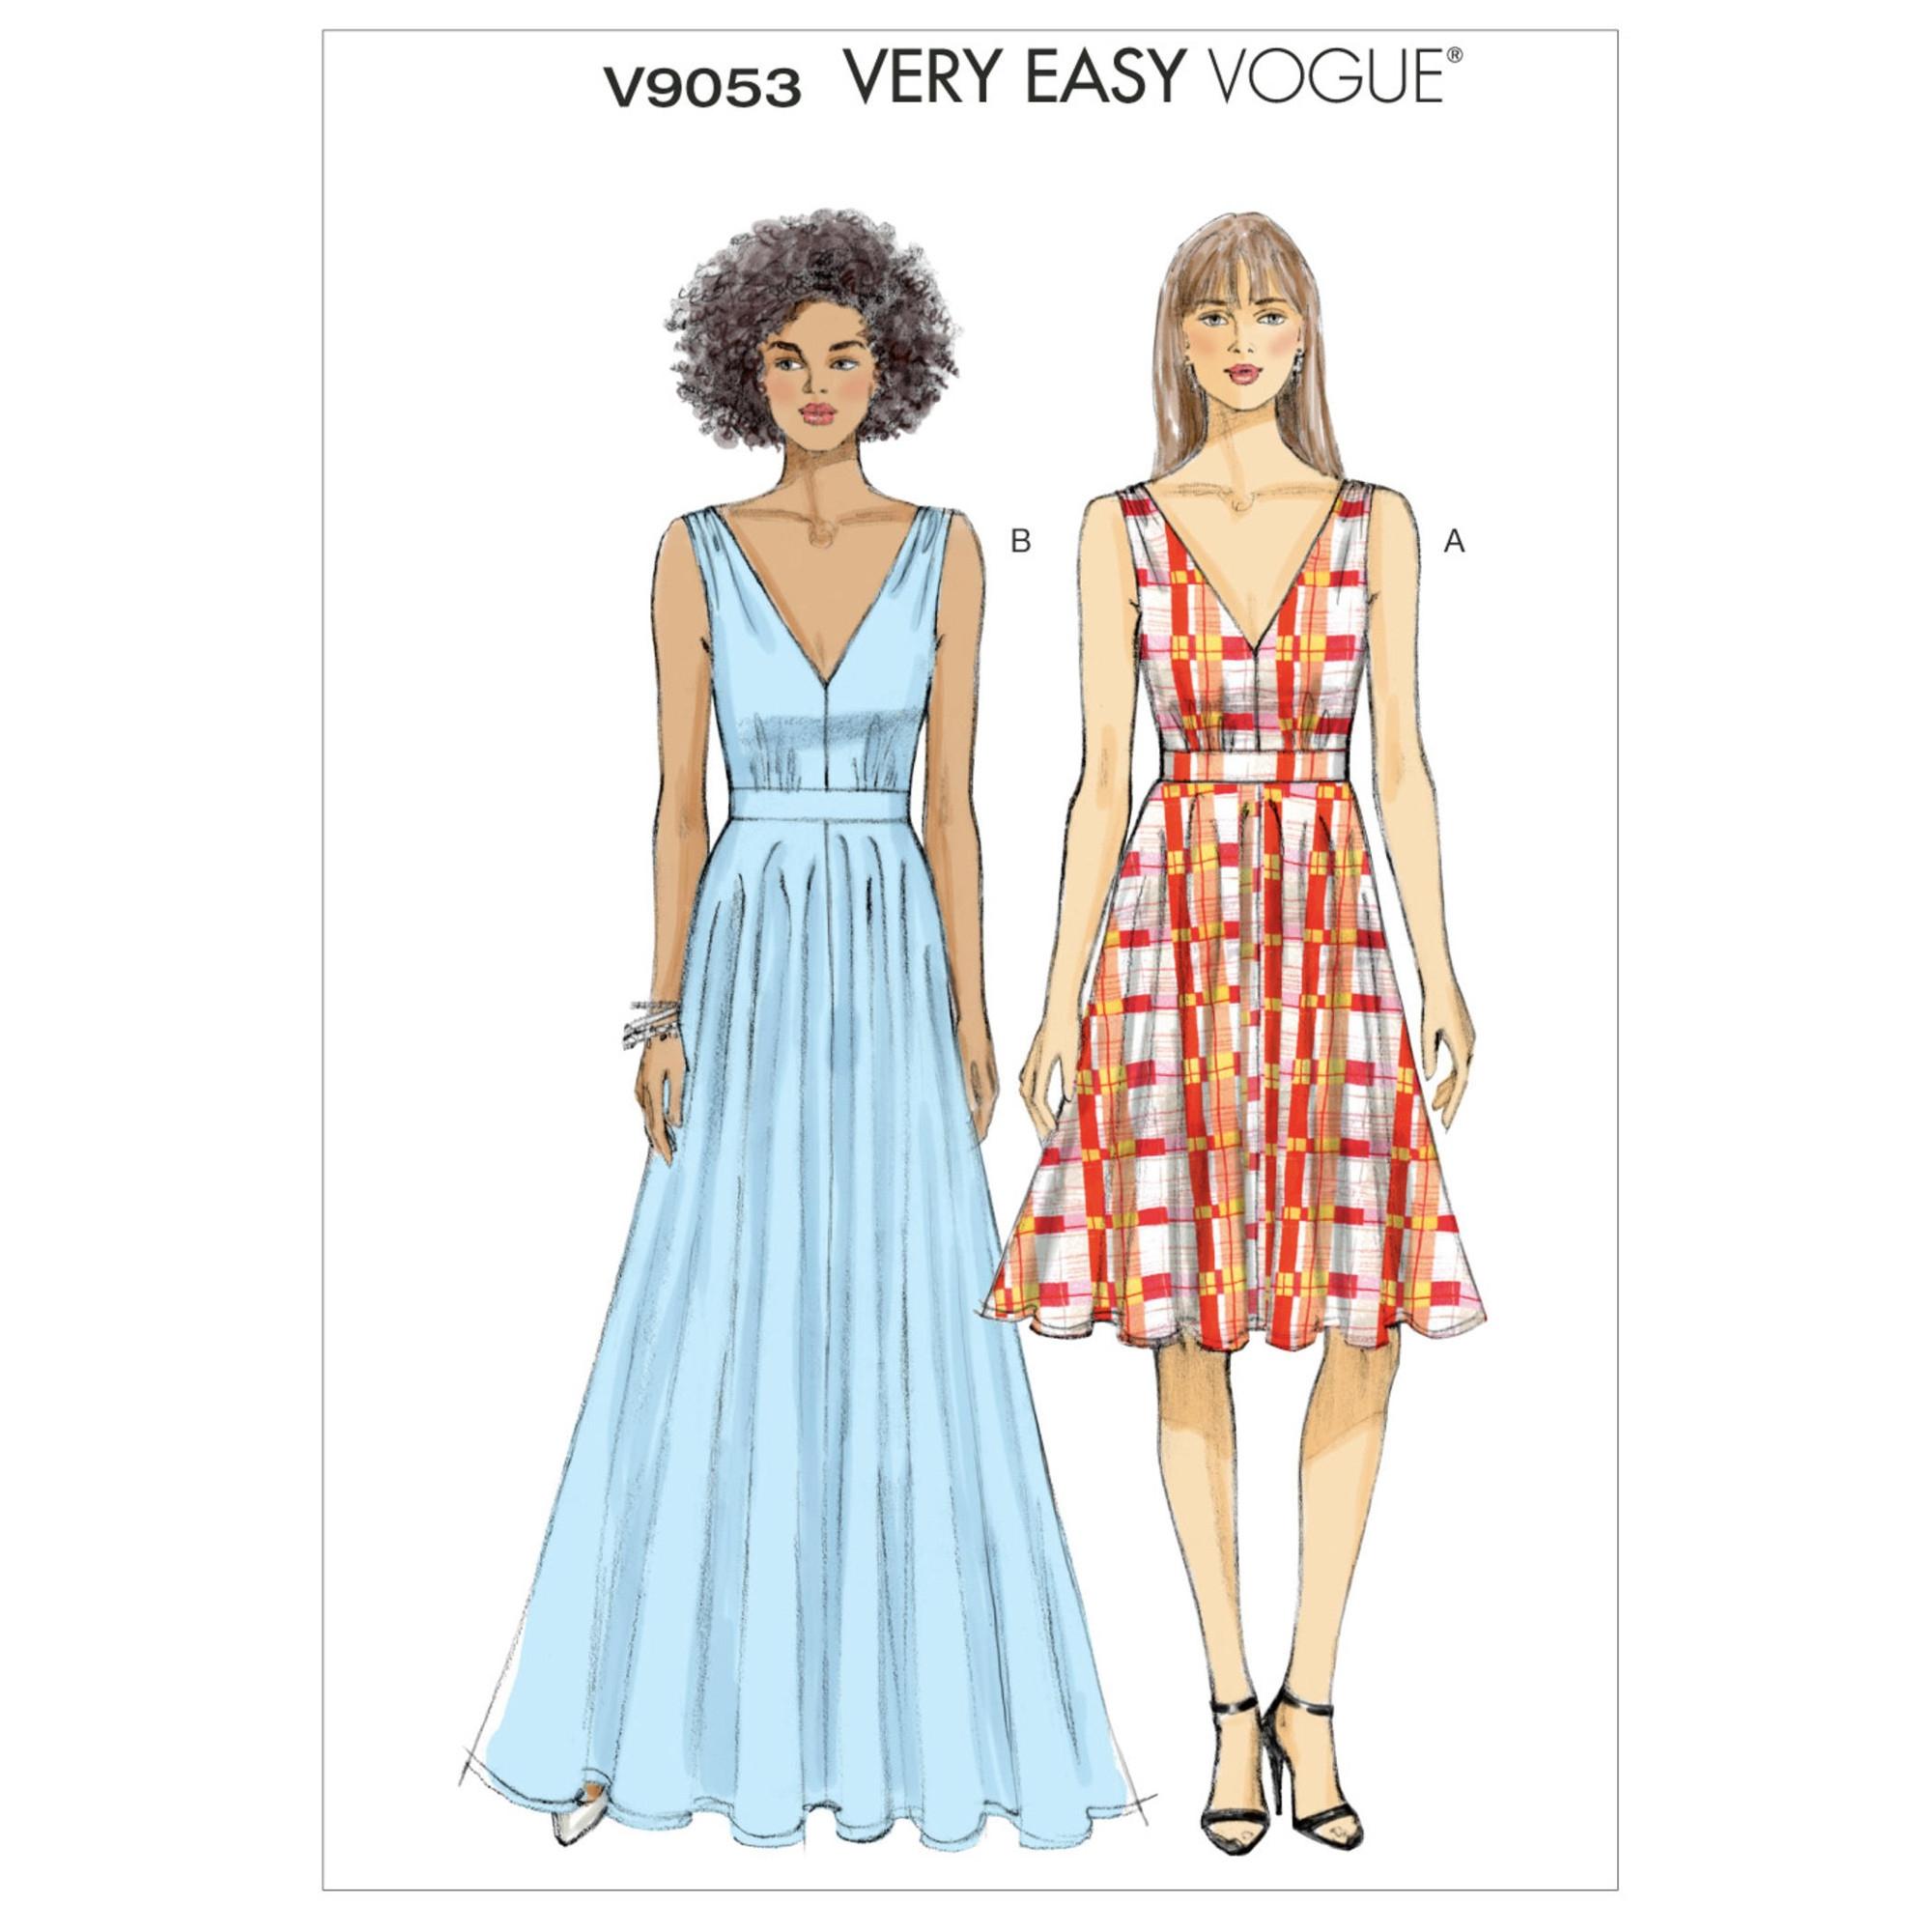 Schnittmuster Vogue 9053 Damen-Kleid | stoffe-hemmers.de